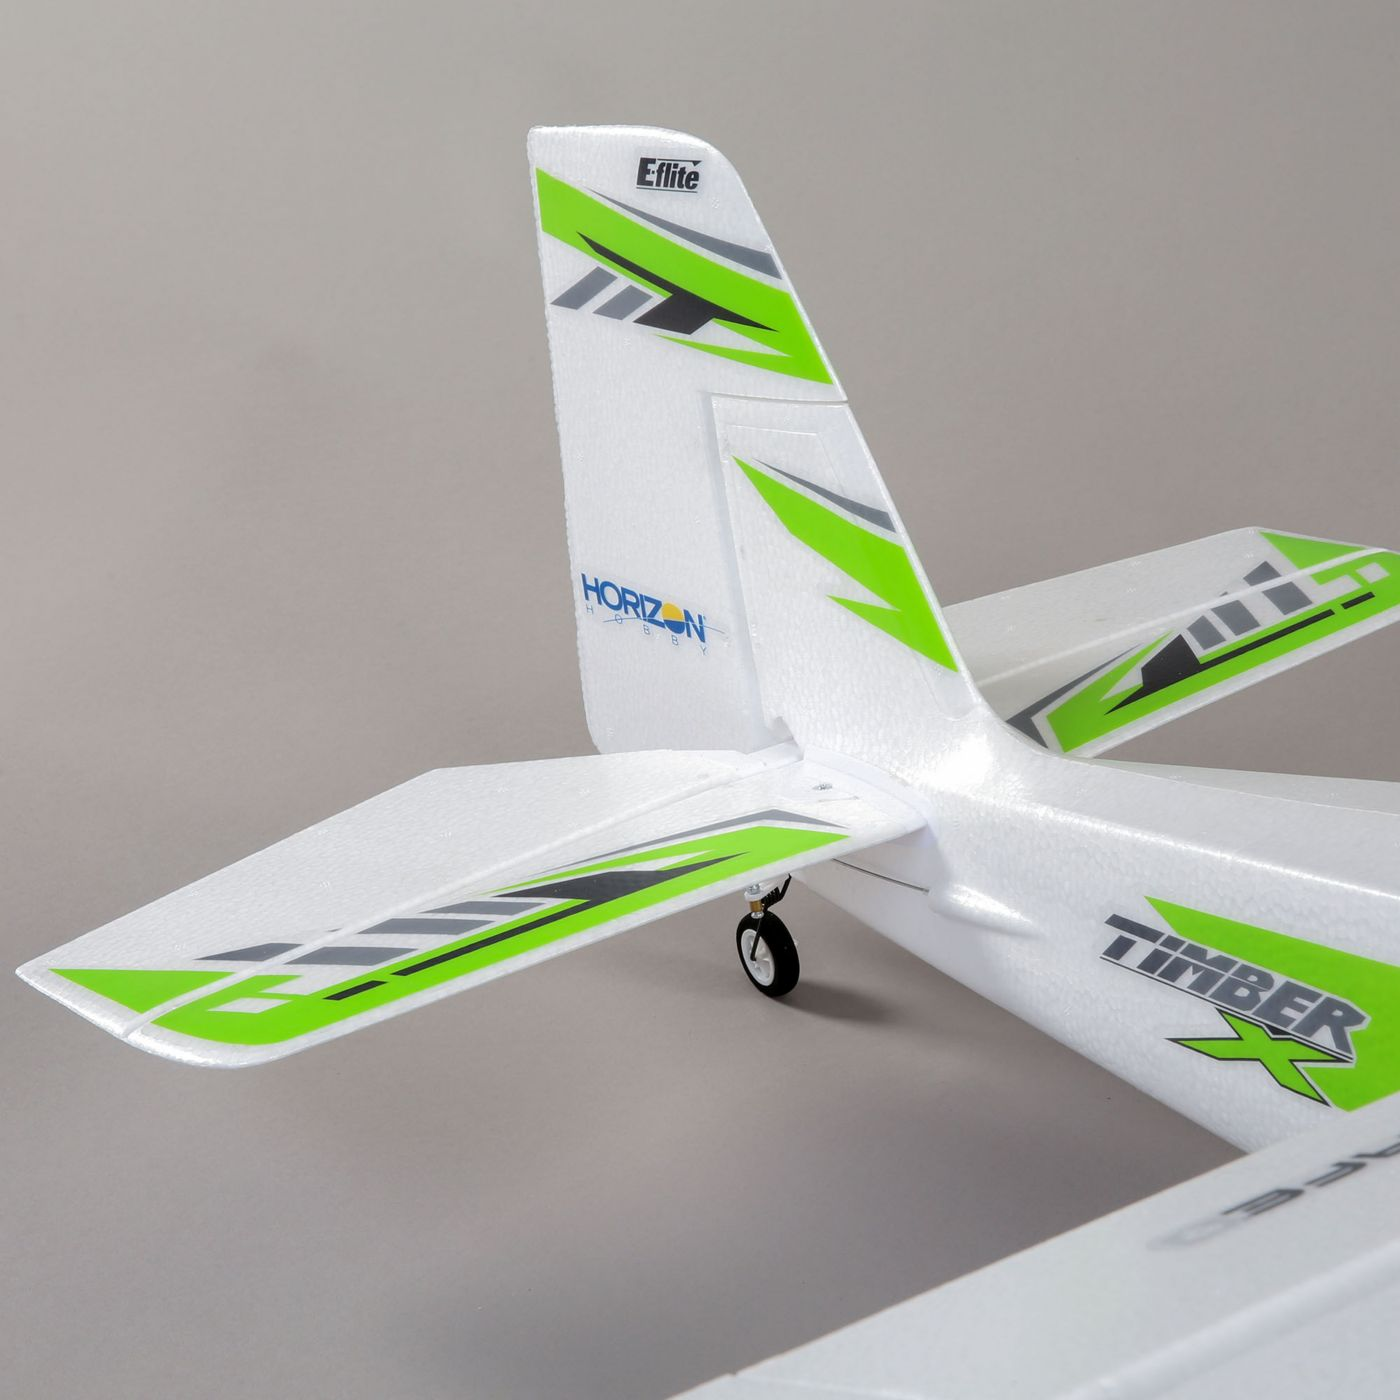 Timber STOL Trifft 3D E-flite